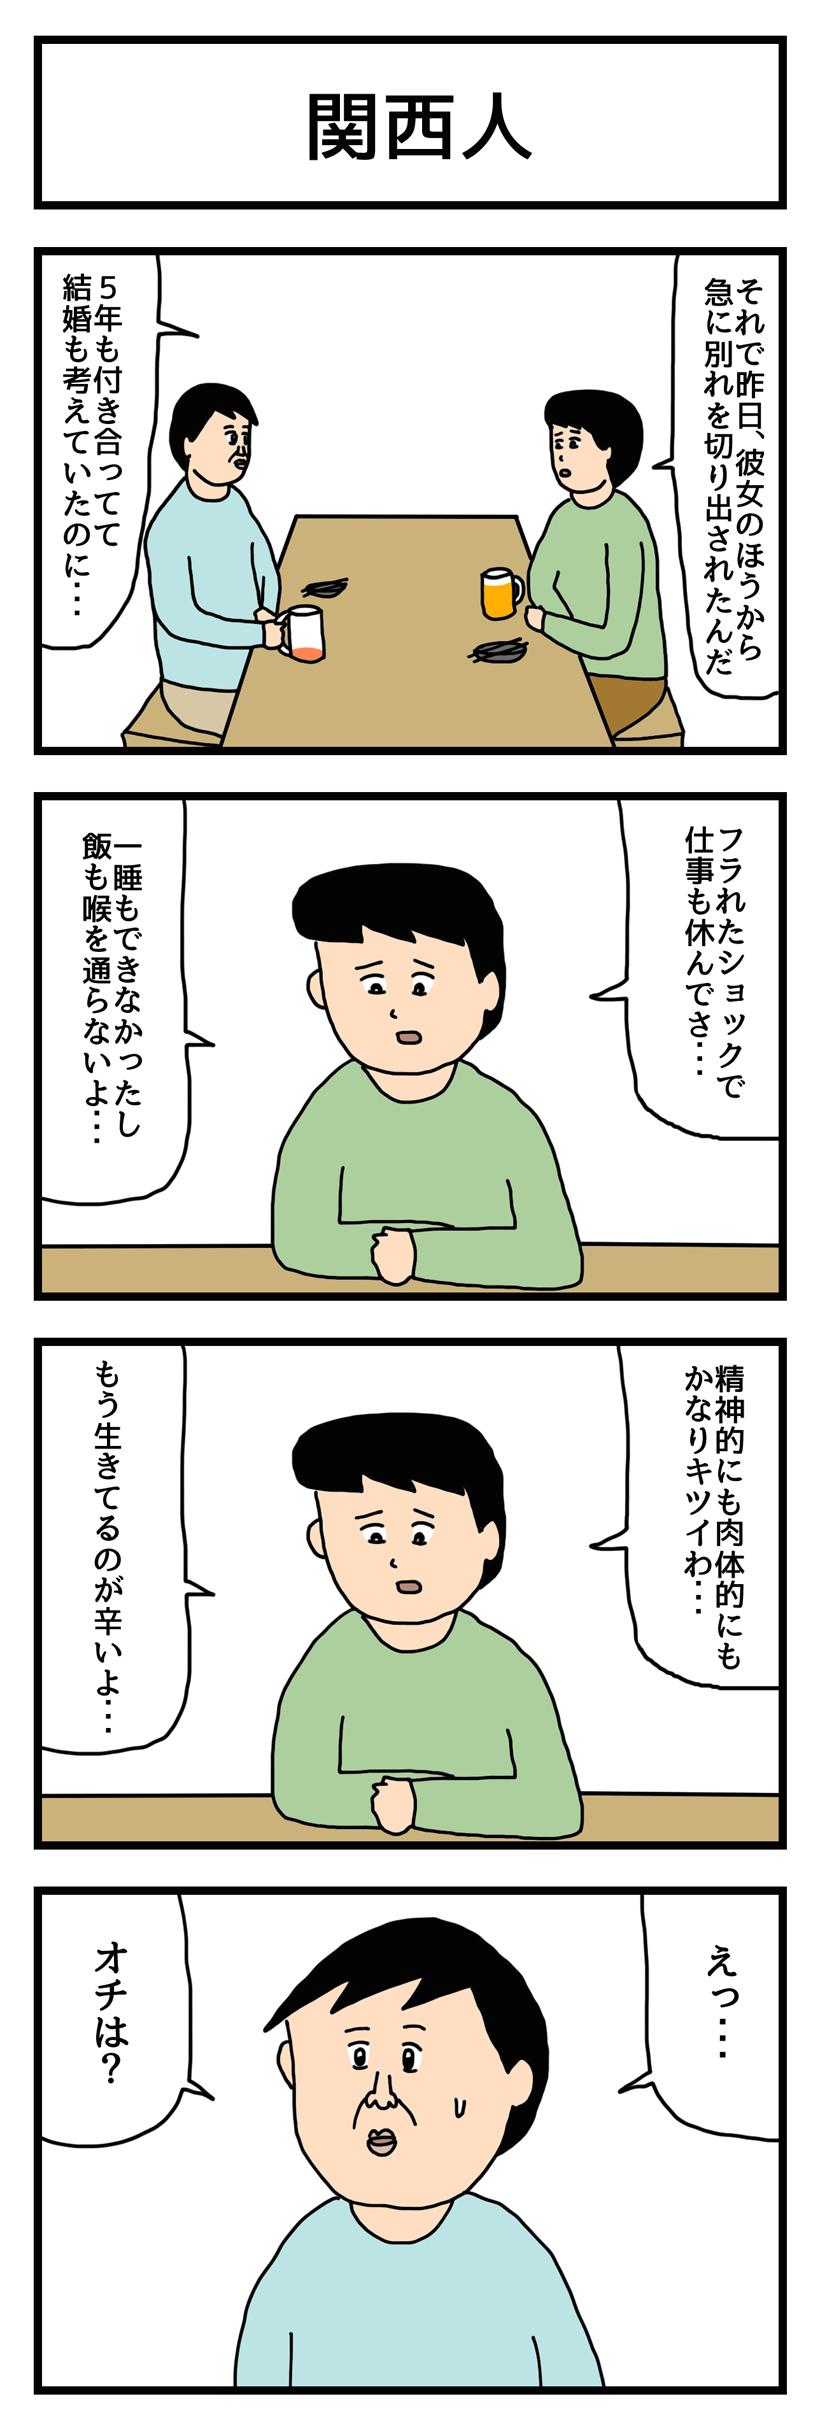 20160513-s-3